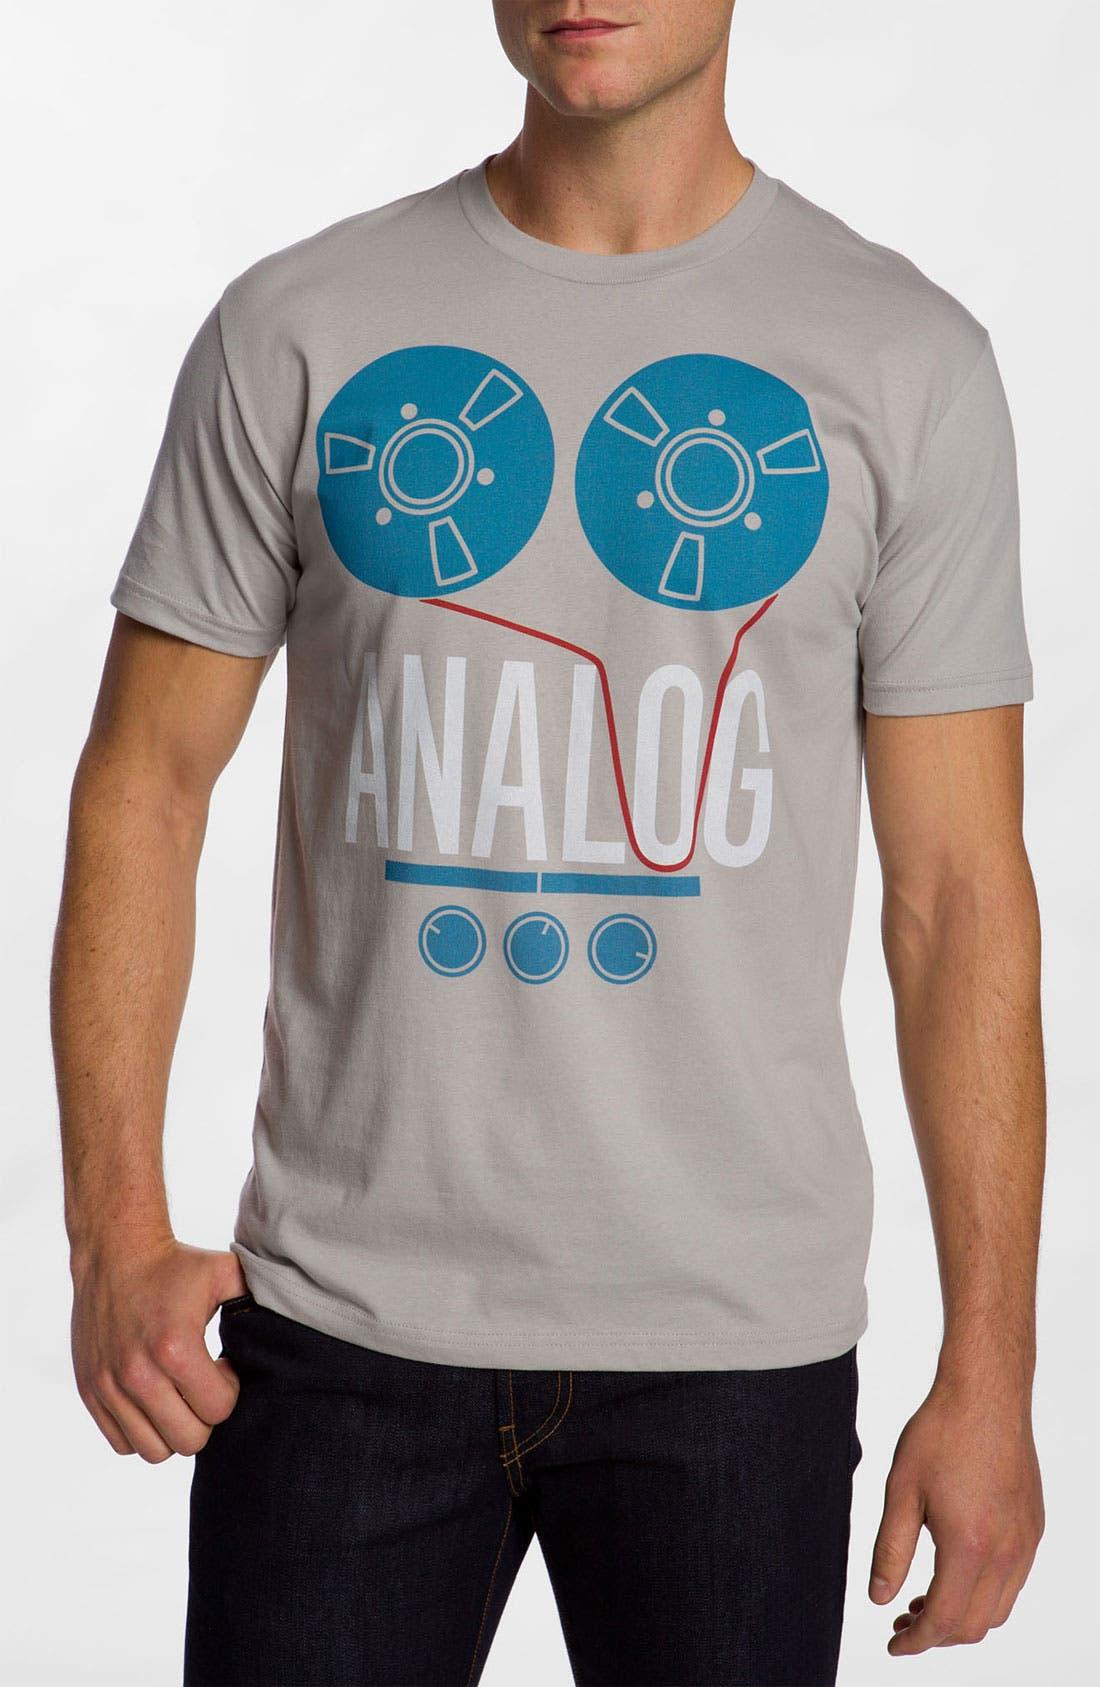 Alternate Image 1 Selected - PalmerCash 'Analog' T-Shirt